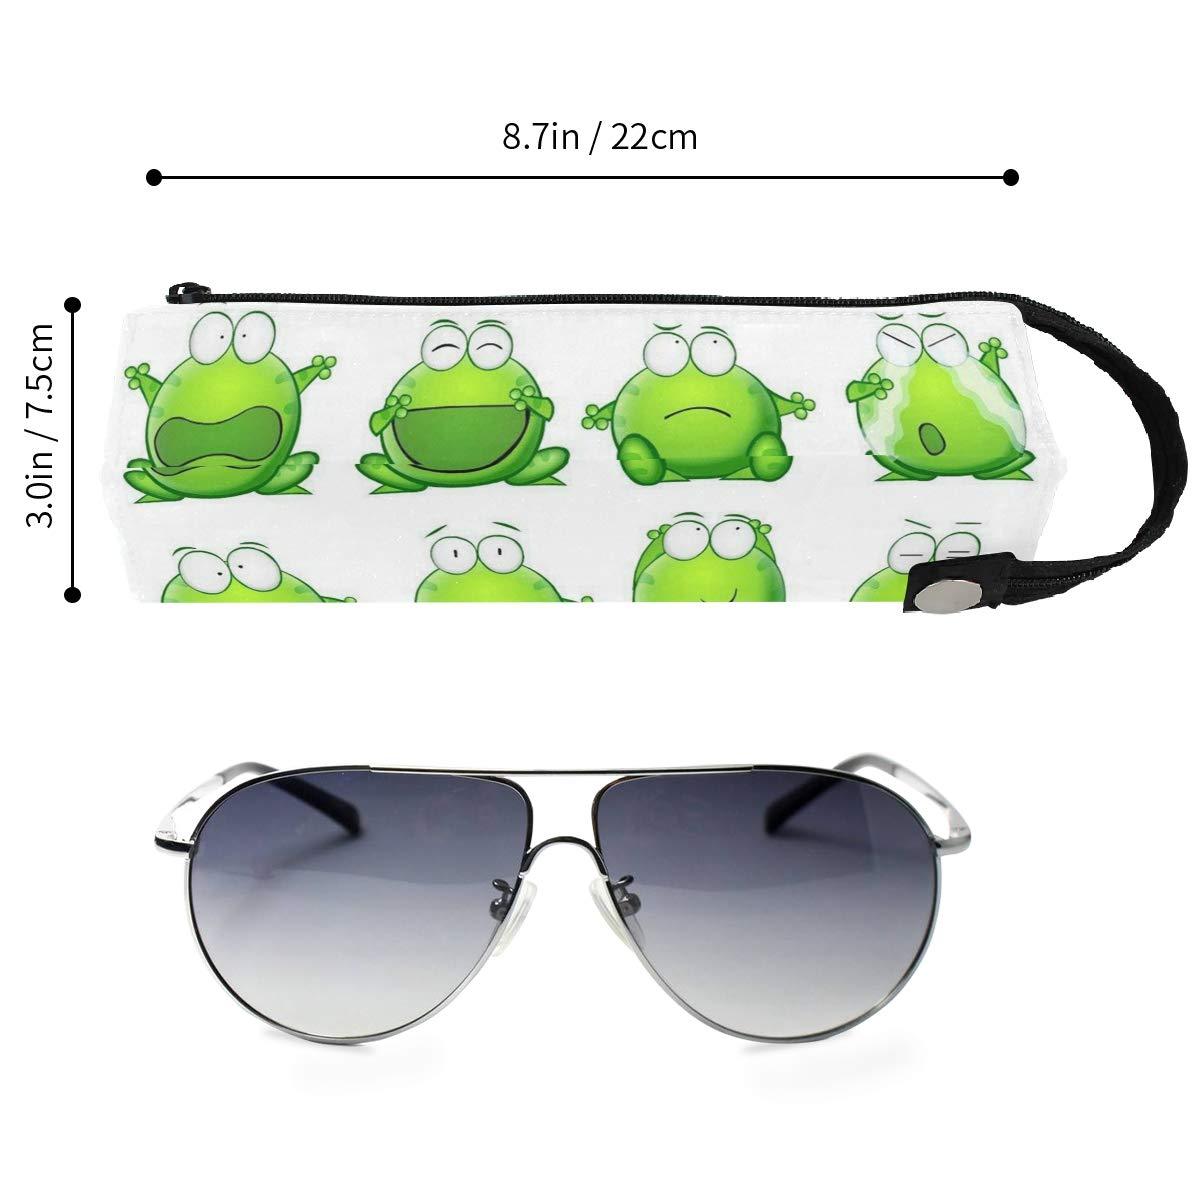 Glasses Case Cartoon Frog Expression Travel Soft Sunglasses Pencil Bag Protective Holder